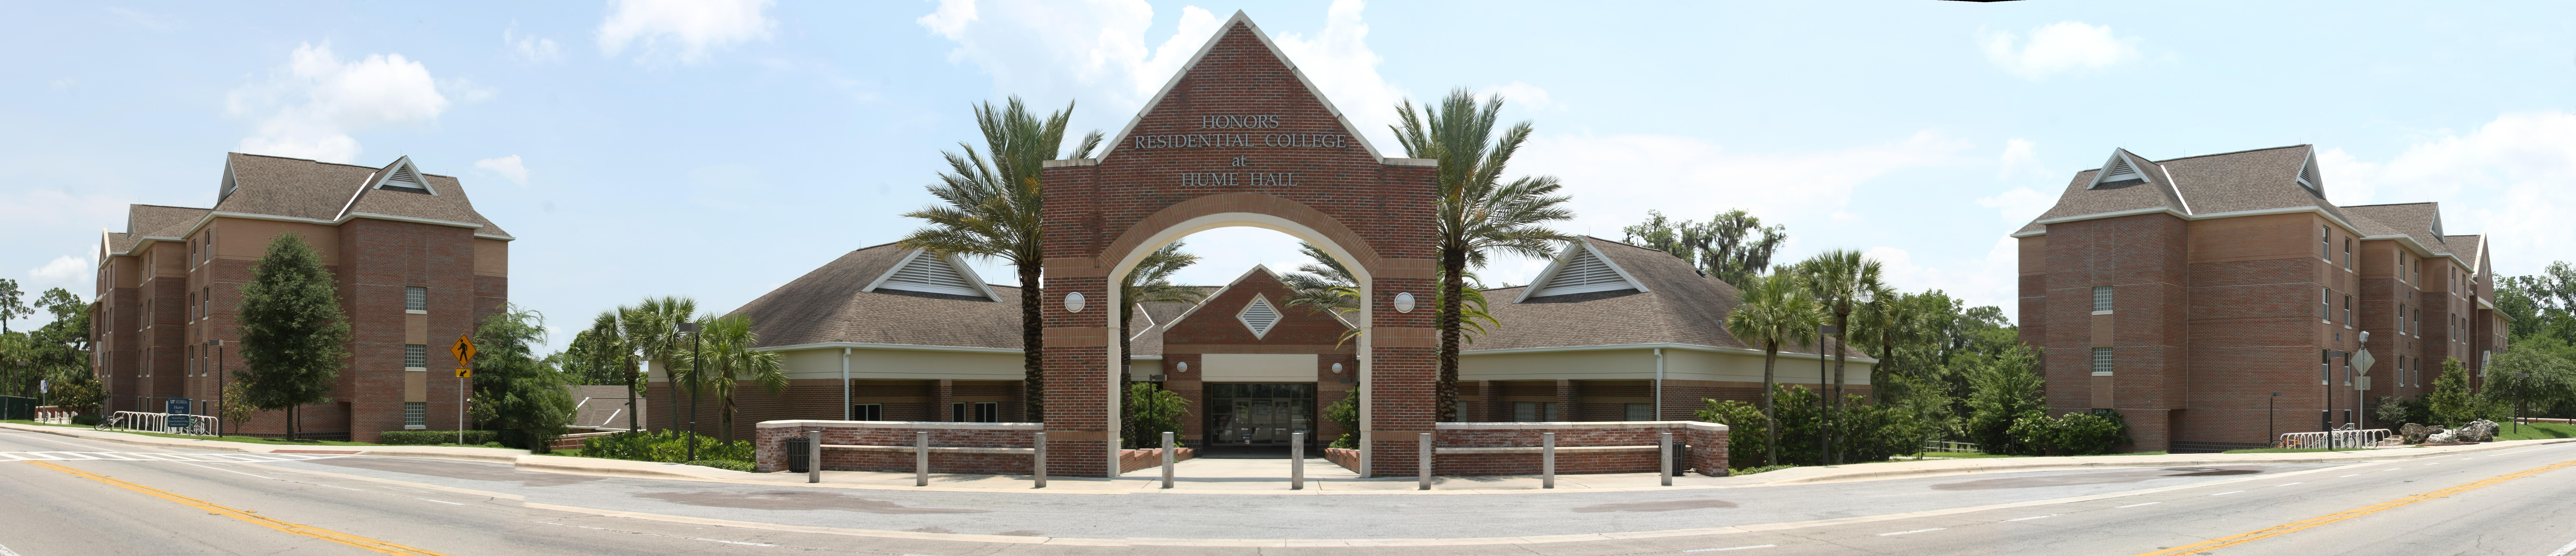 Hume Hall images